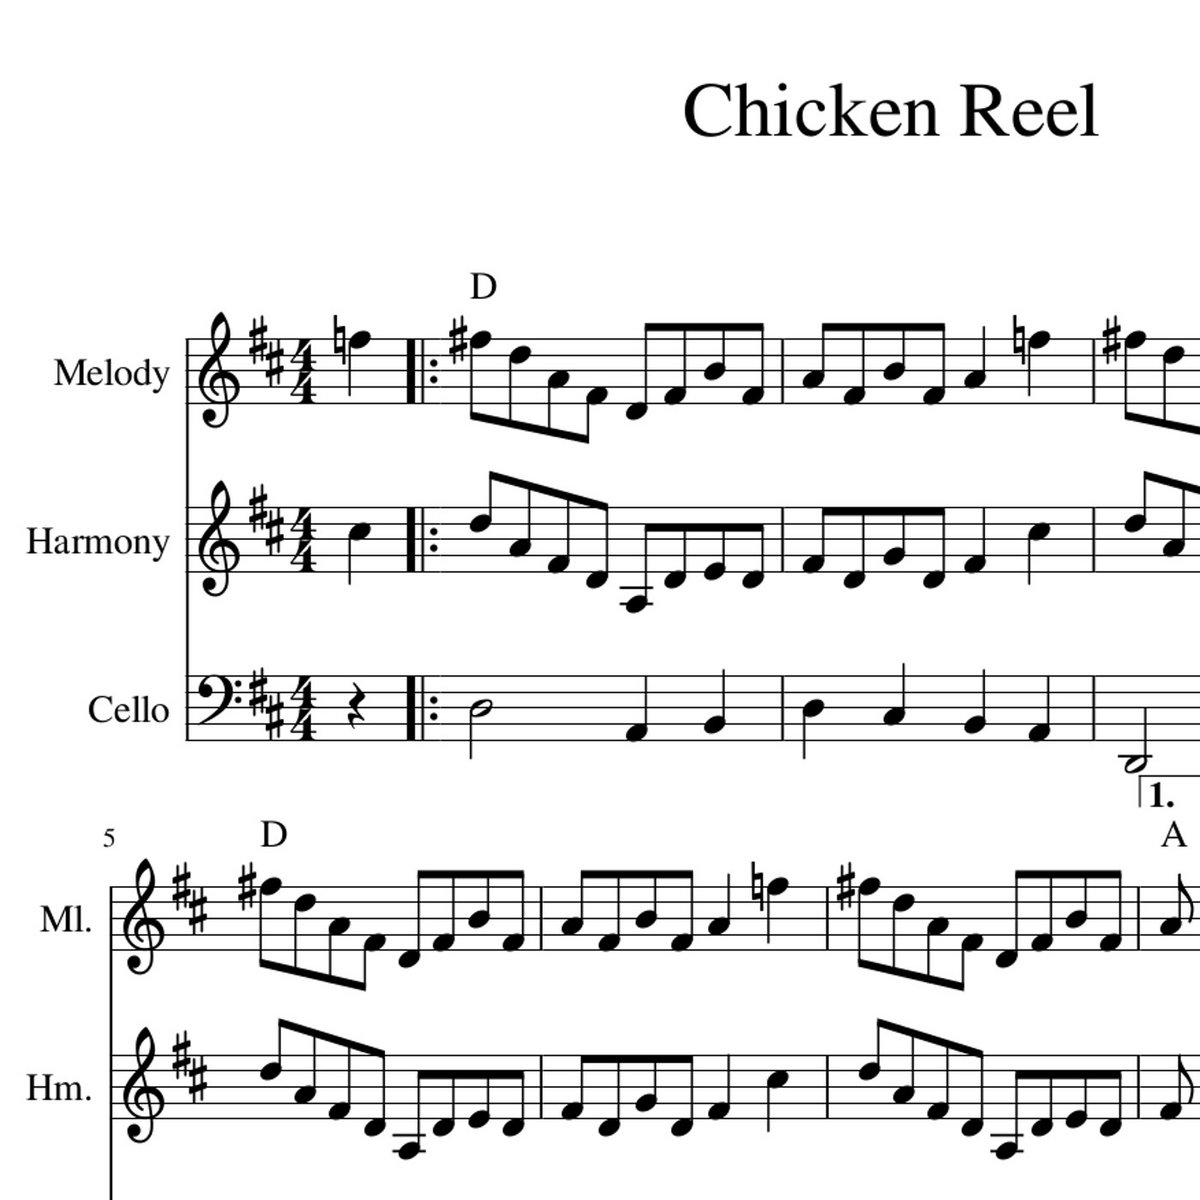 Chicken Reel - Old Time / Bluegrass Sheet Music arrangement for two